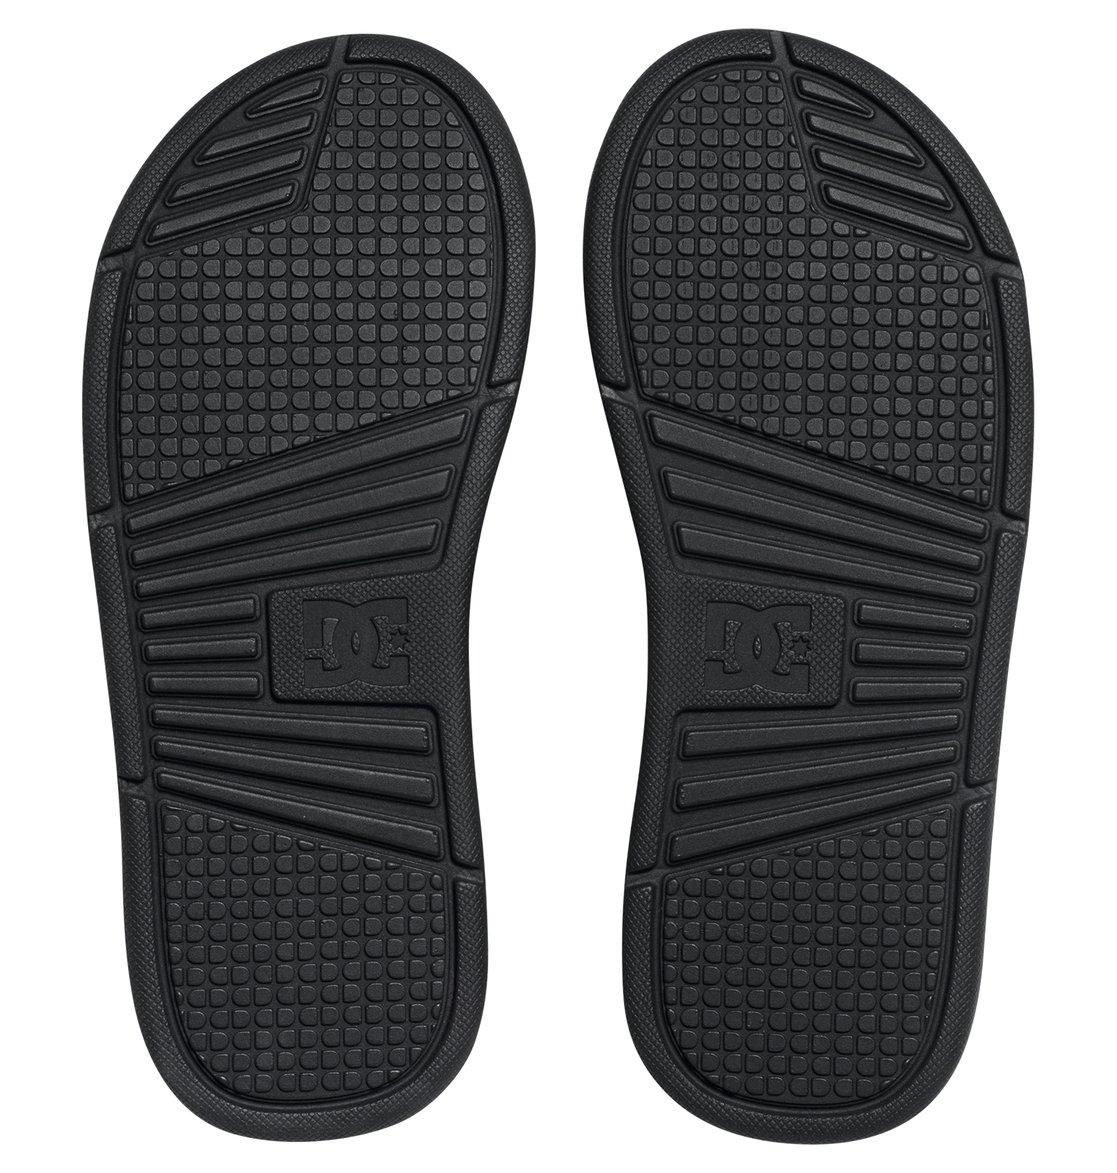 Black sandals jones - 4 Men S Bolsa Slider Sandals Adyl100026 Dc Shoes